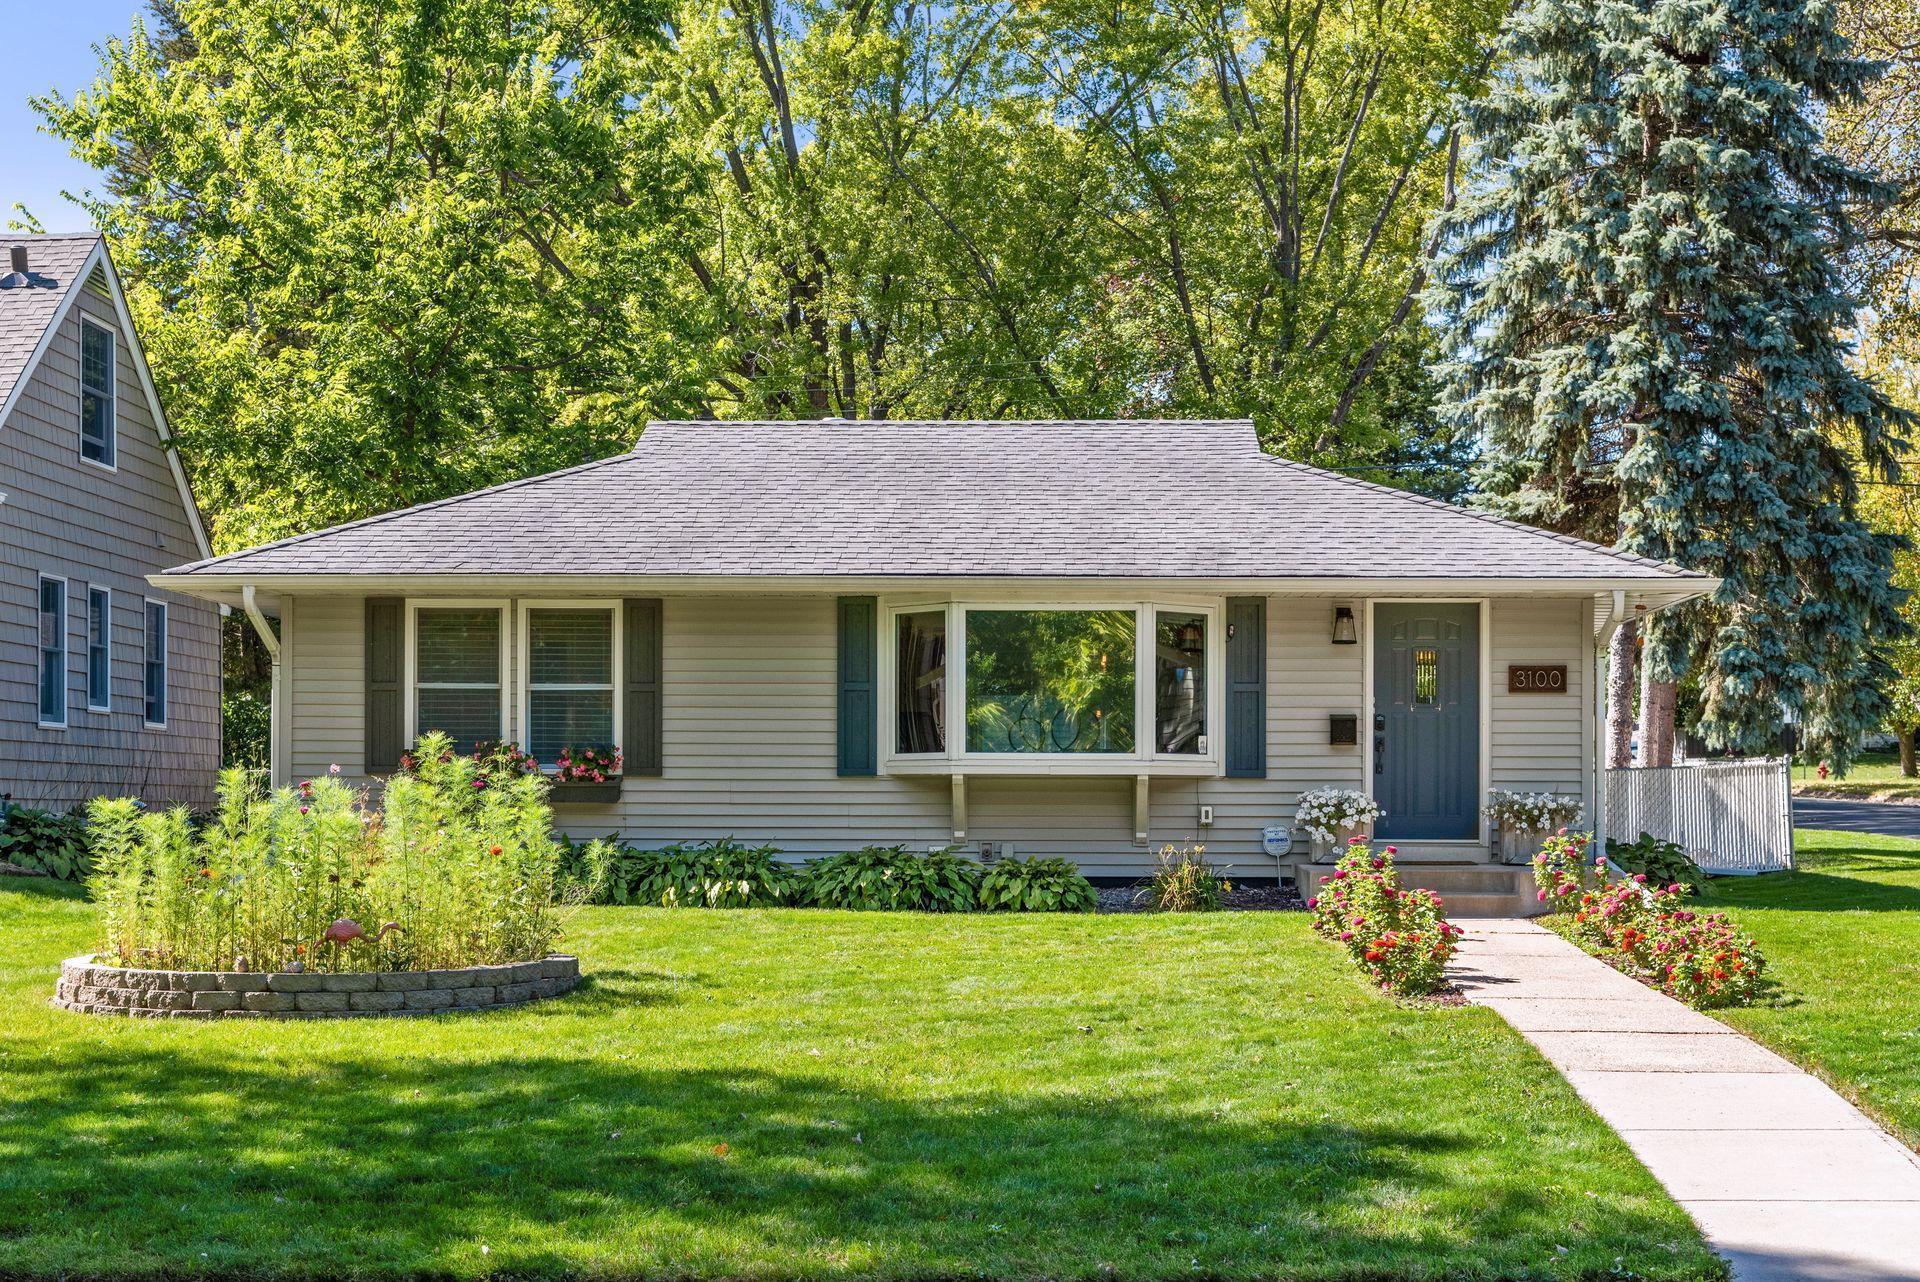 3100 Pennsylvania Avenue S Property Photo - Saint Louis Park, MN real estate listing